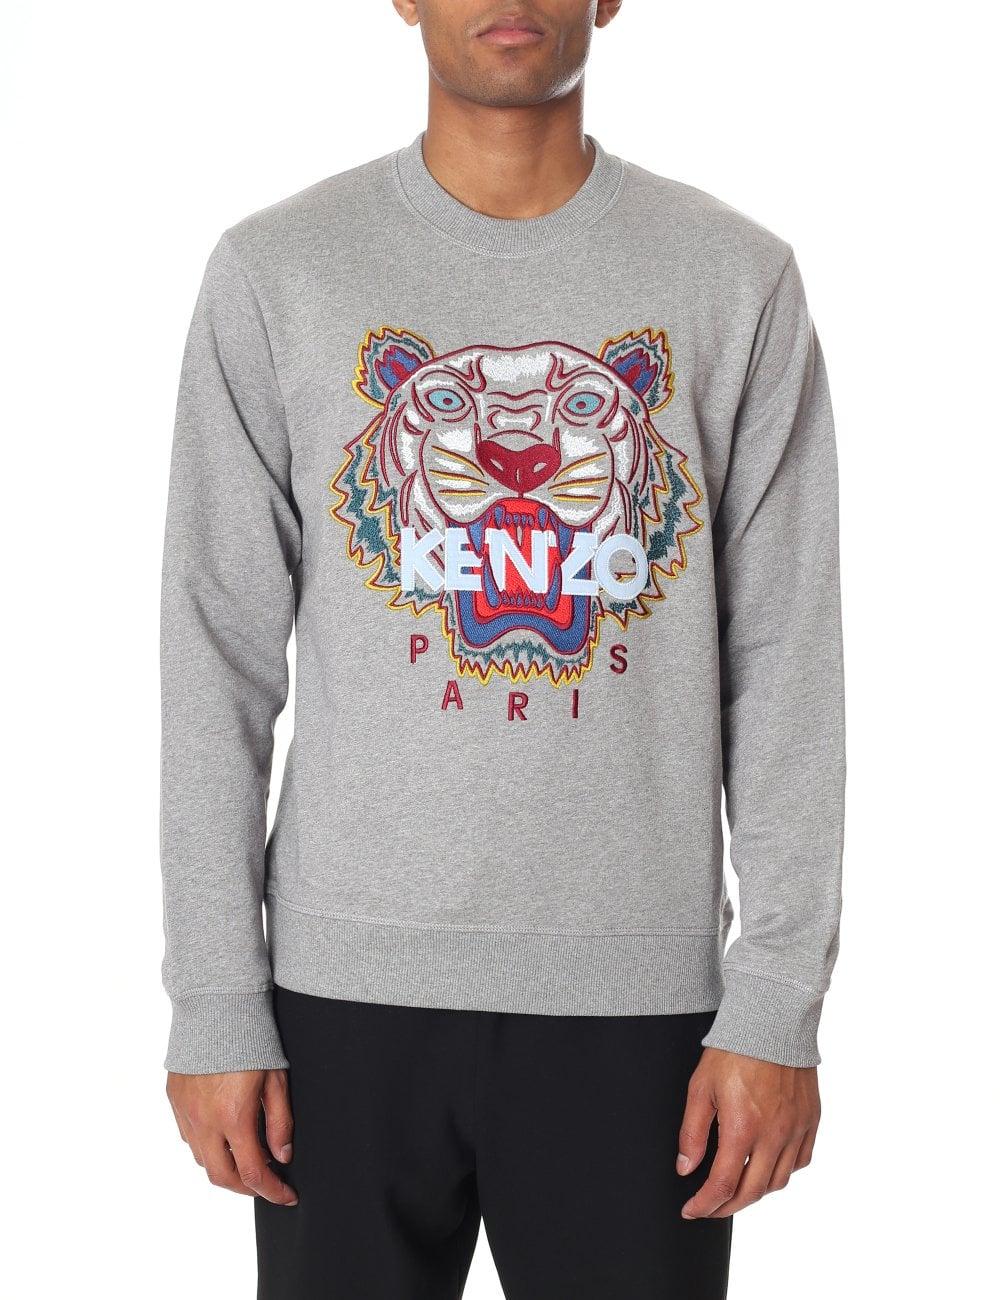 0dfefb3bfc Kenzo Men's Tiger Sweatshirt